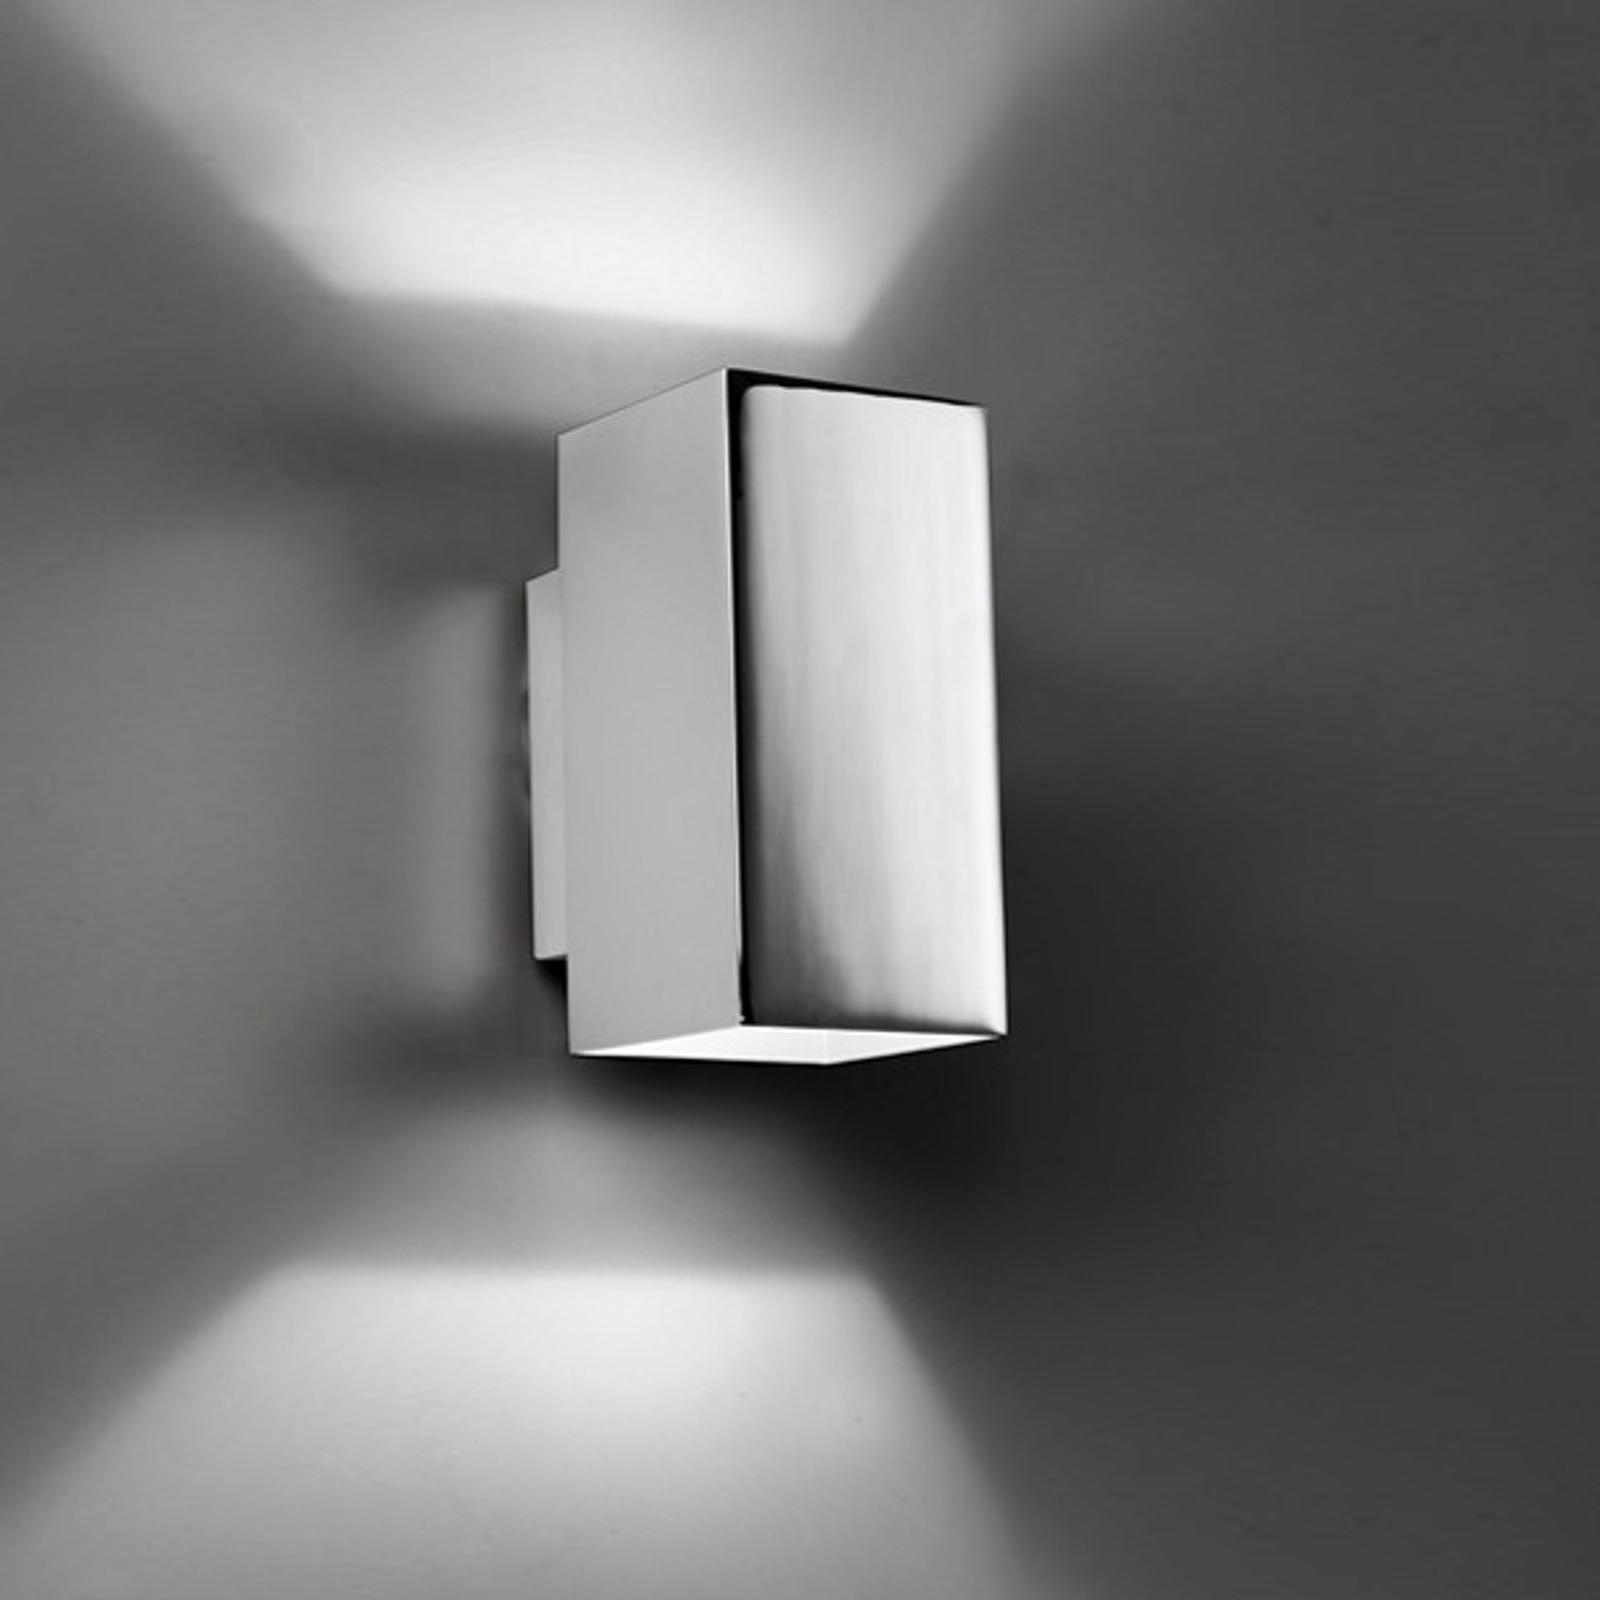 Applique LED Up-Down chrome